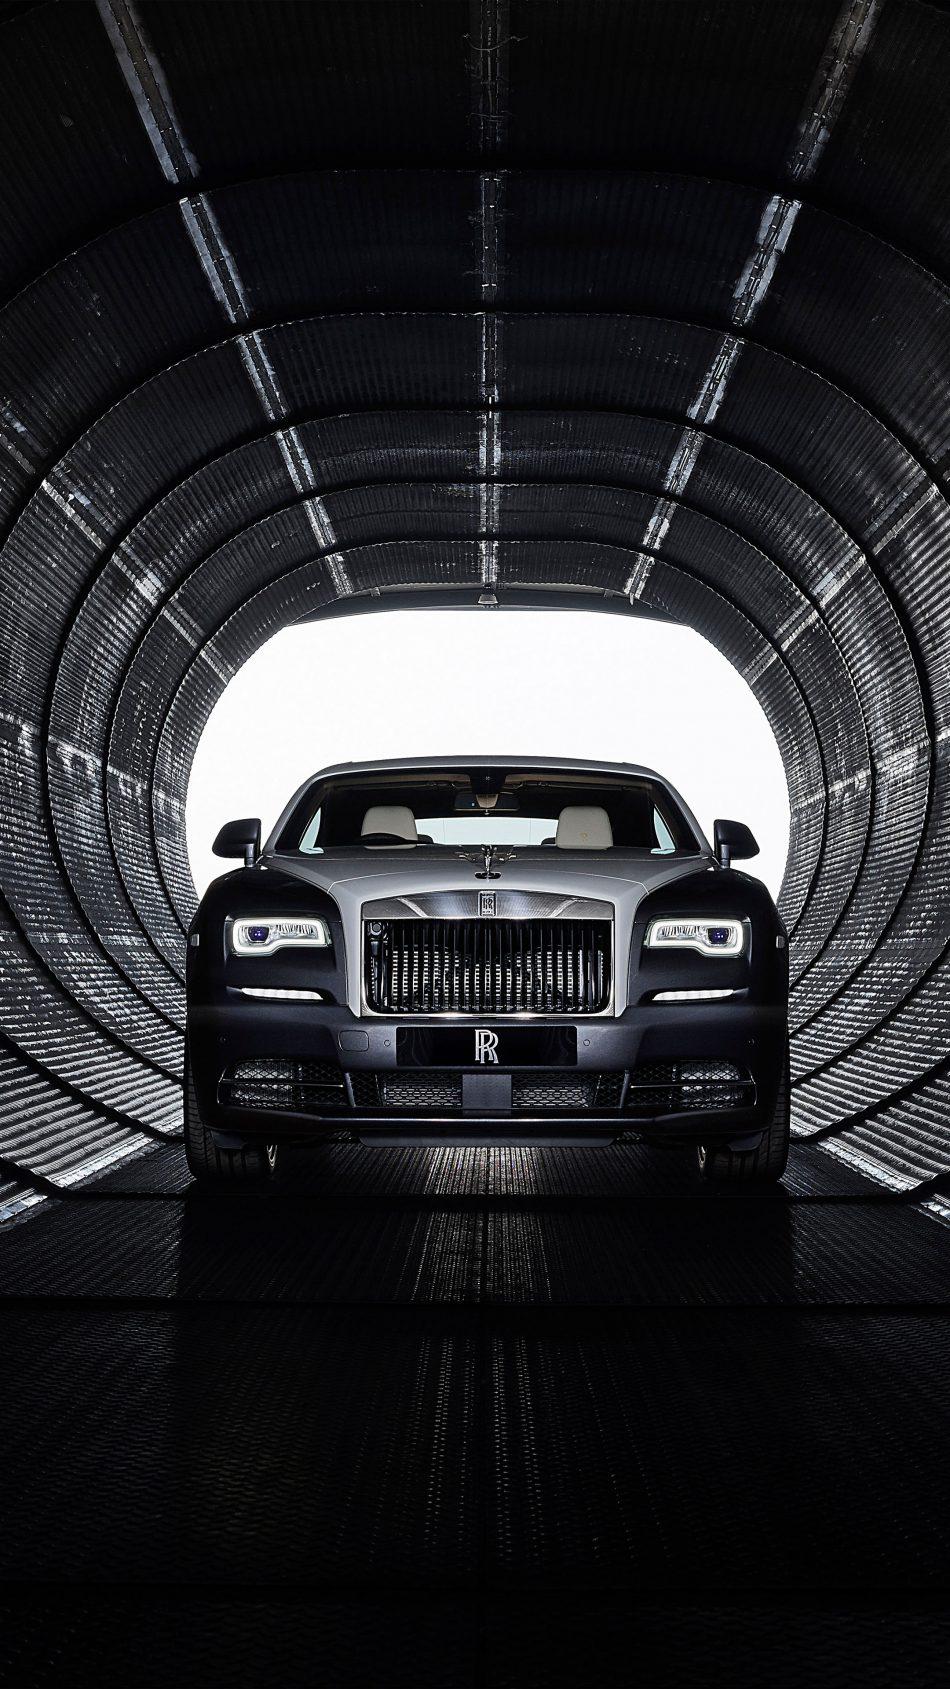 Rolls Royce Wraith Eagle VIII 4K Ultra HD Mobile Wallpaper